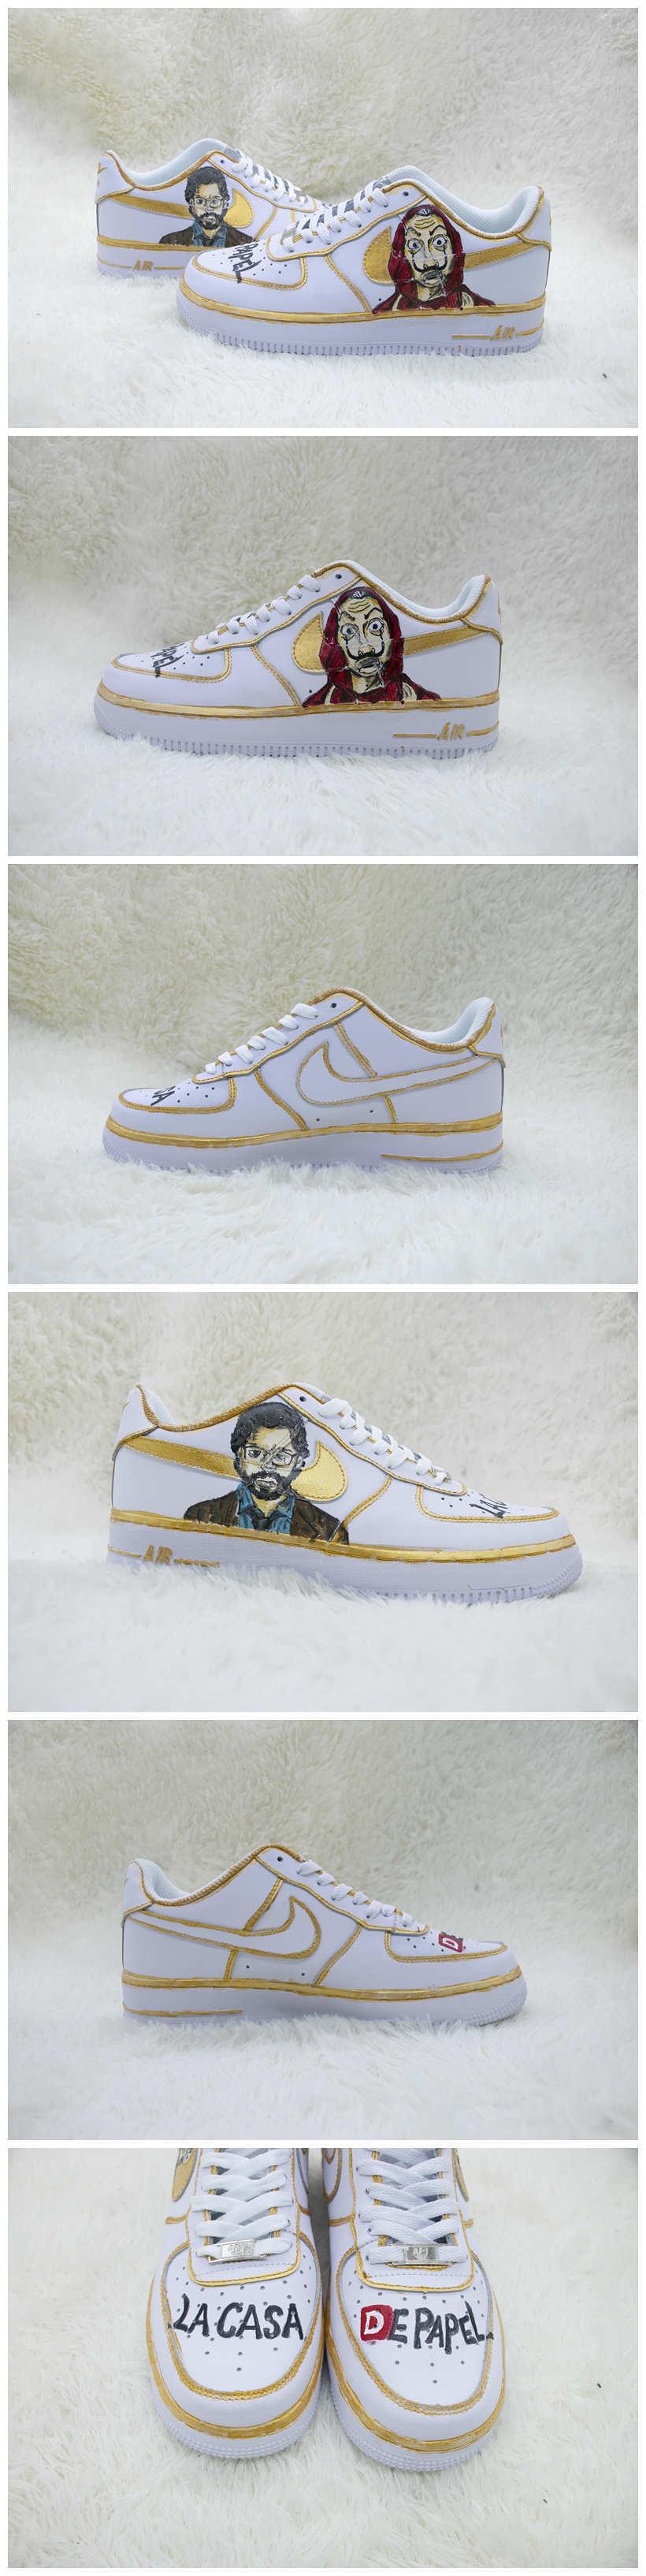 Custom La Casa De Papel Shoes For Air Force 1 White Graffiti Hand Painted Sneaker - A008Custom La Casa De Papel Shoes For Air Force 1 Graffiti Hand Painted Sneaker - The Zero Custom